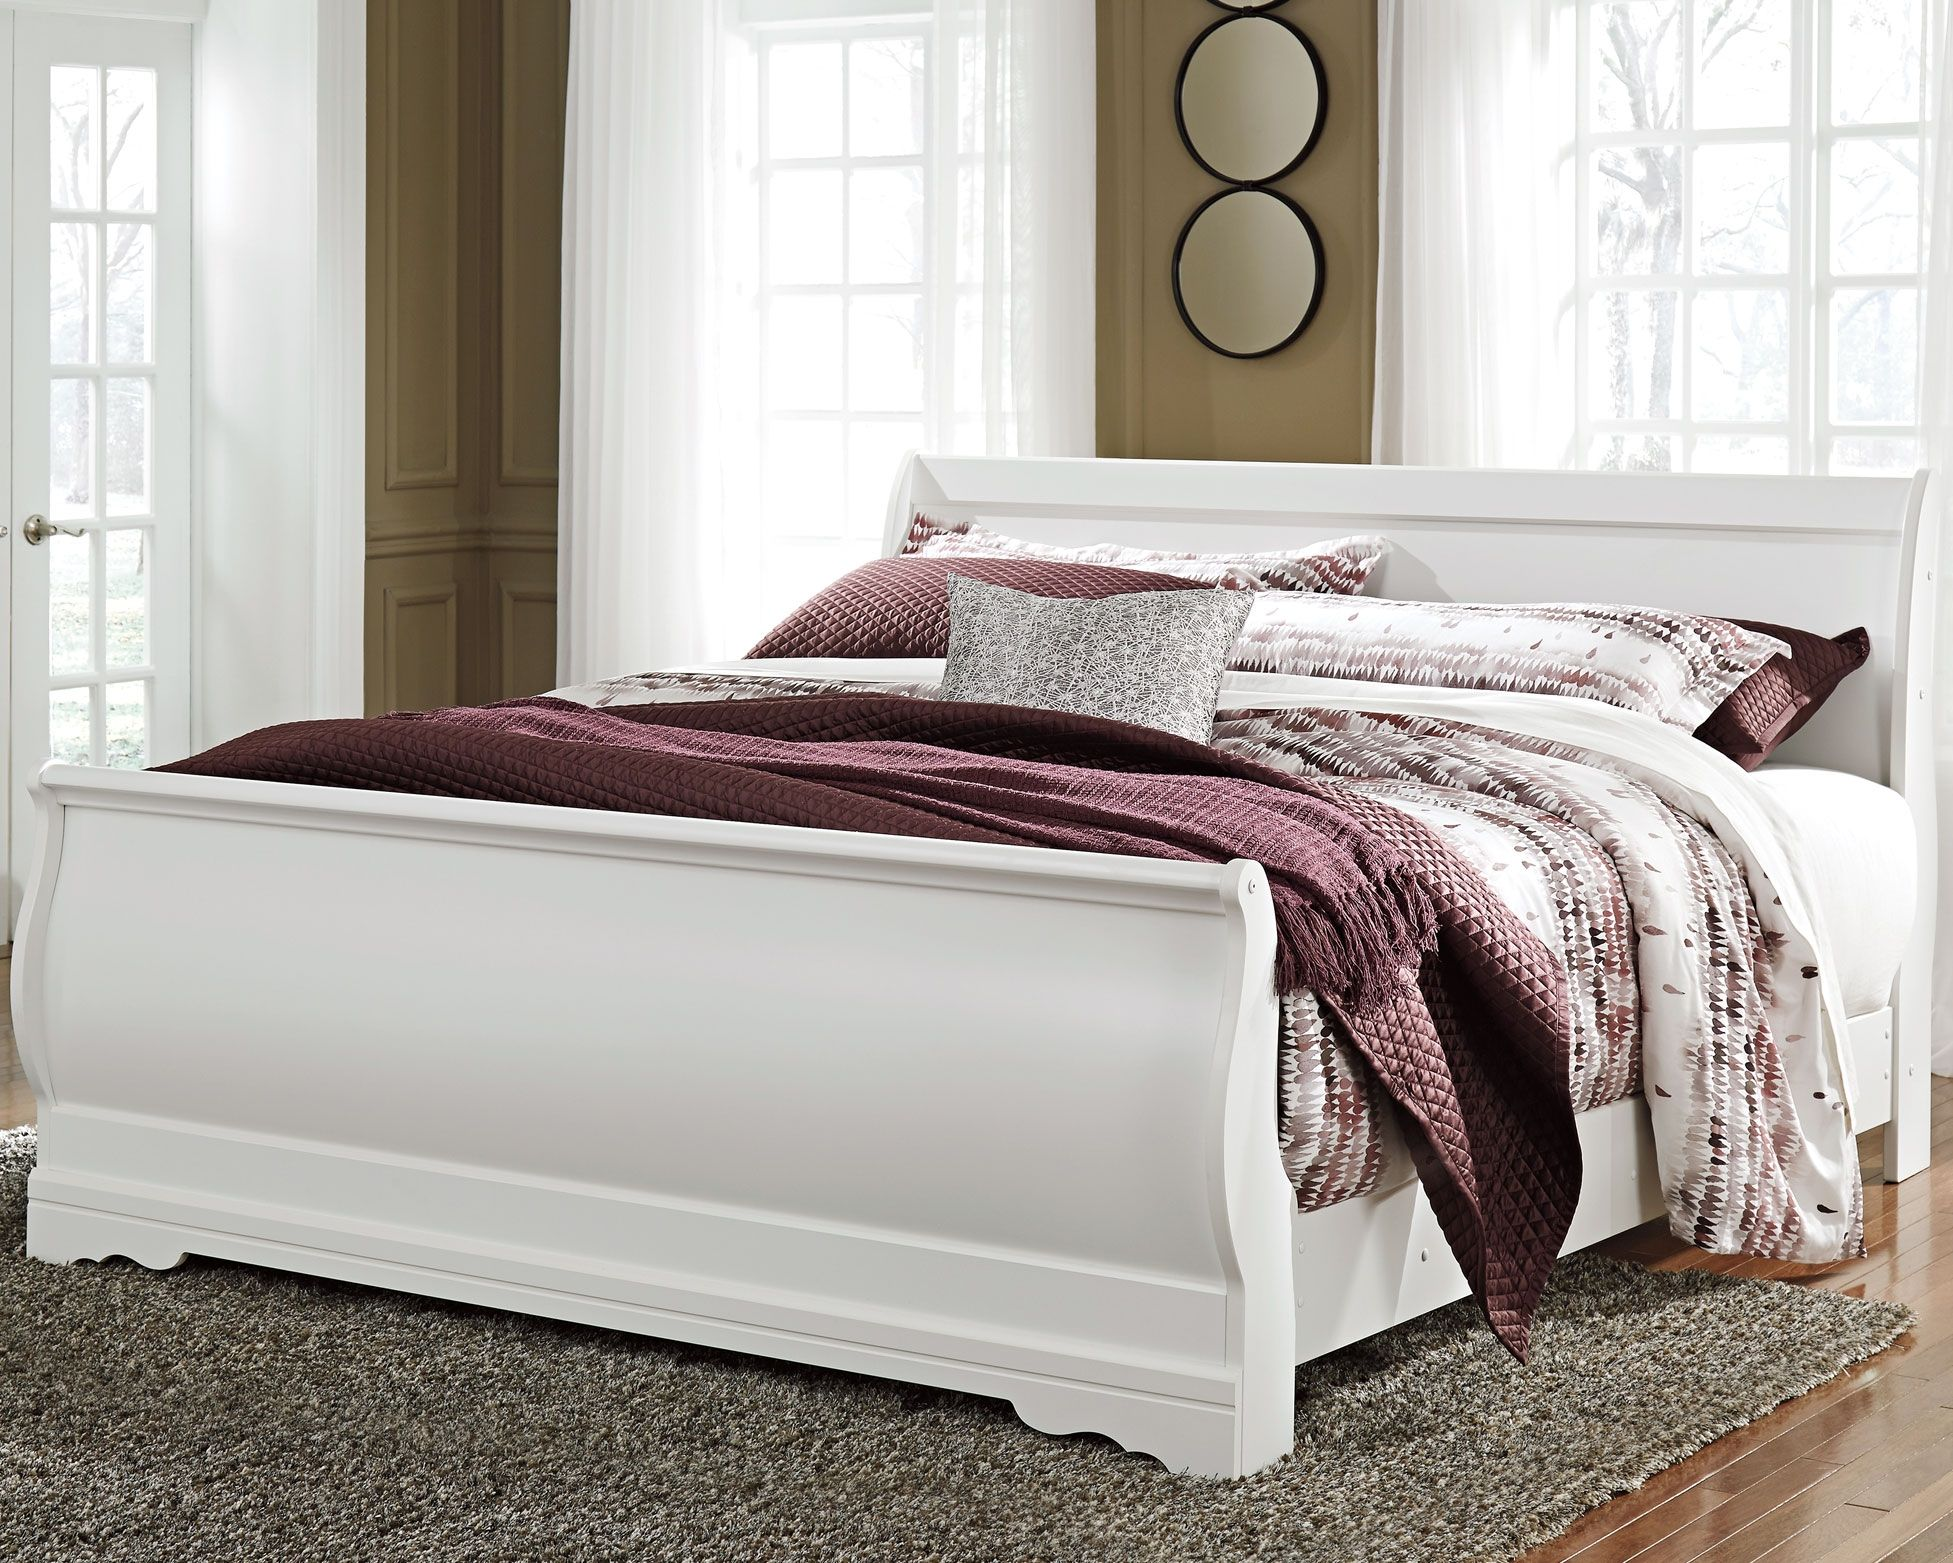 - Anarasia King Sleigh Bed, White White Headboard, Sleigh Beds